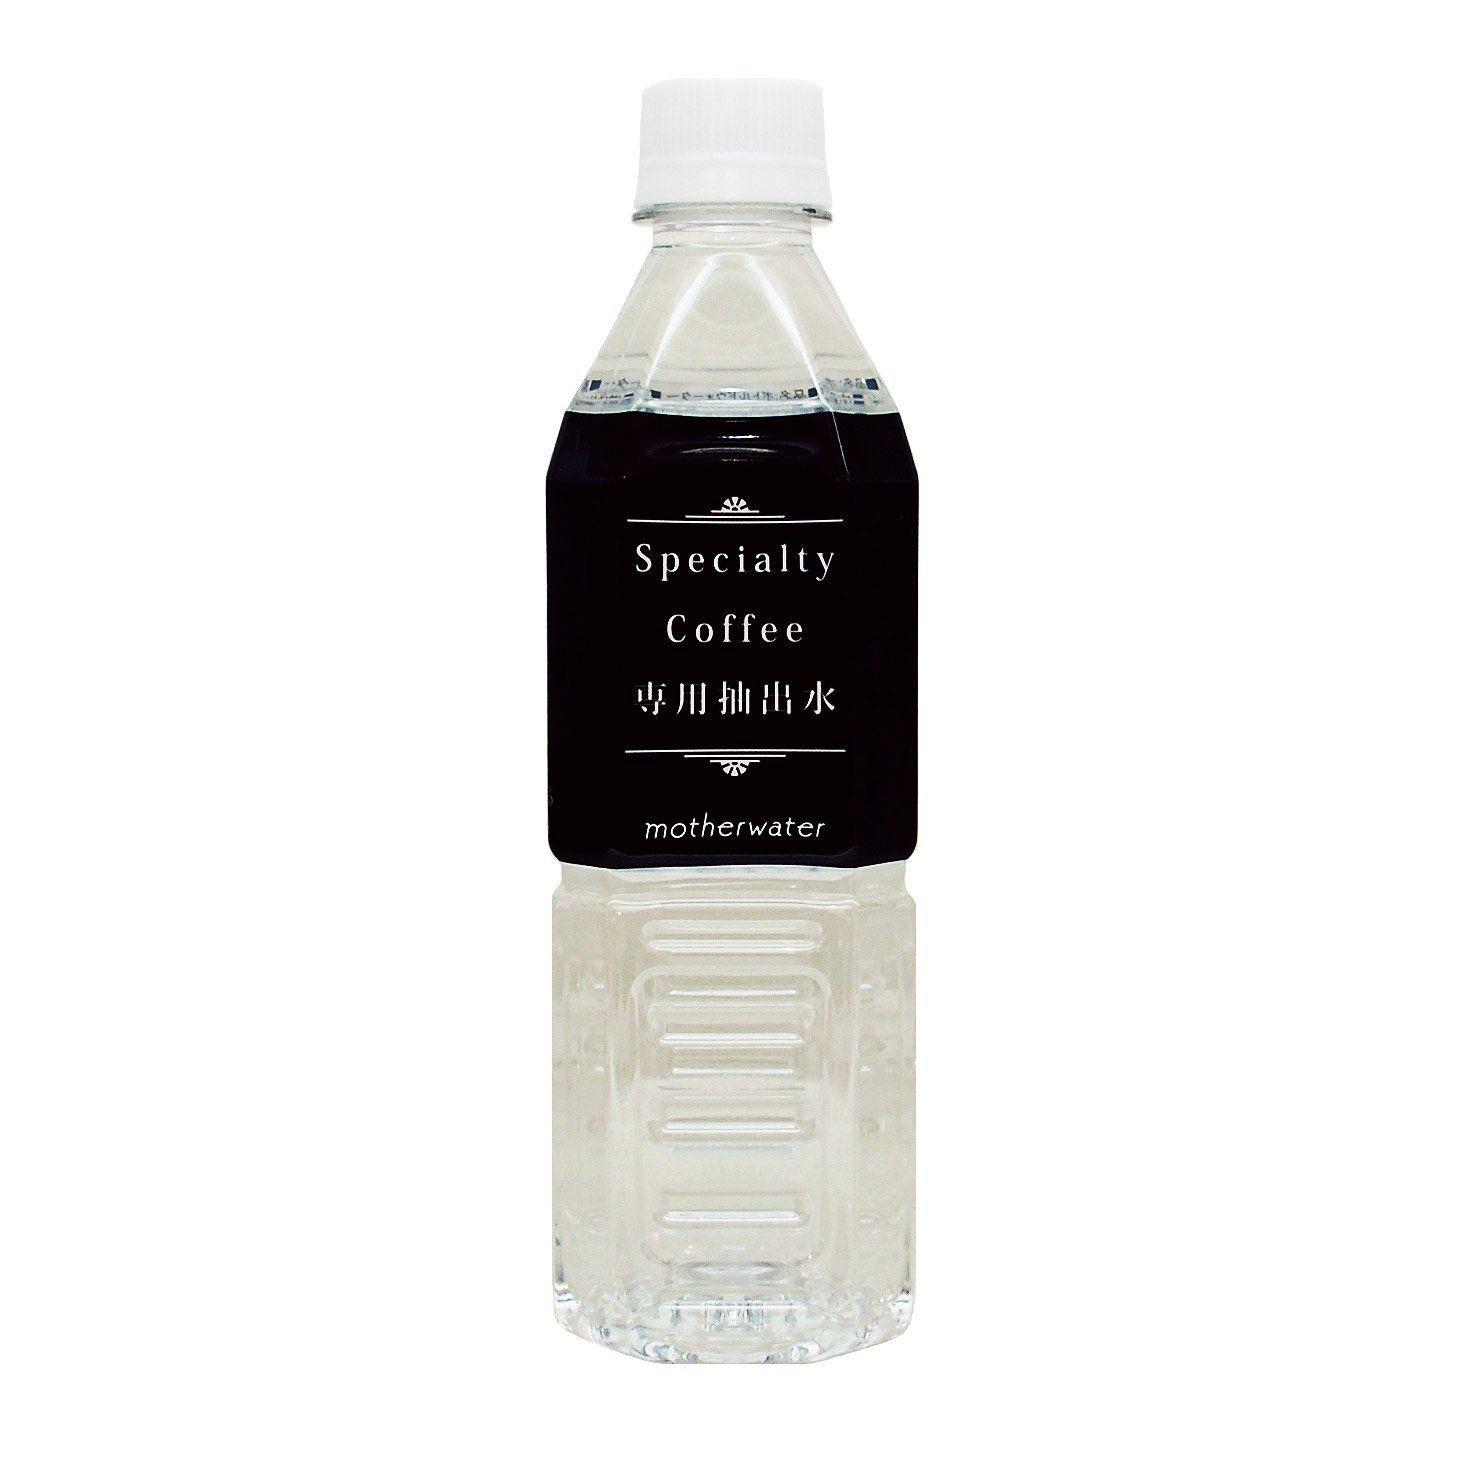 SPECIALTY COFFEE BREWING WATER 500ml / スペシャルティコーヒー専用抽出水 500ml